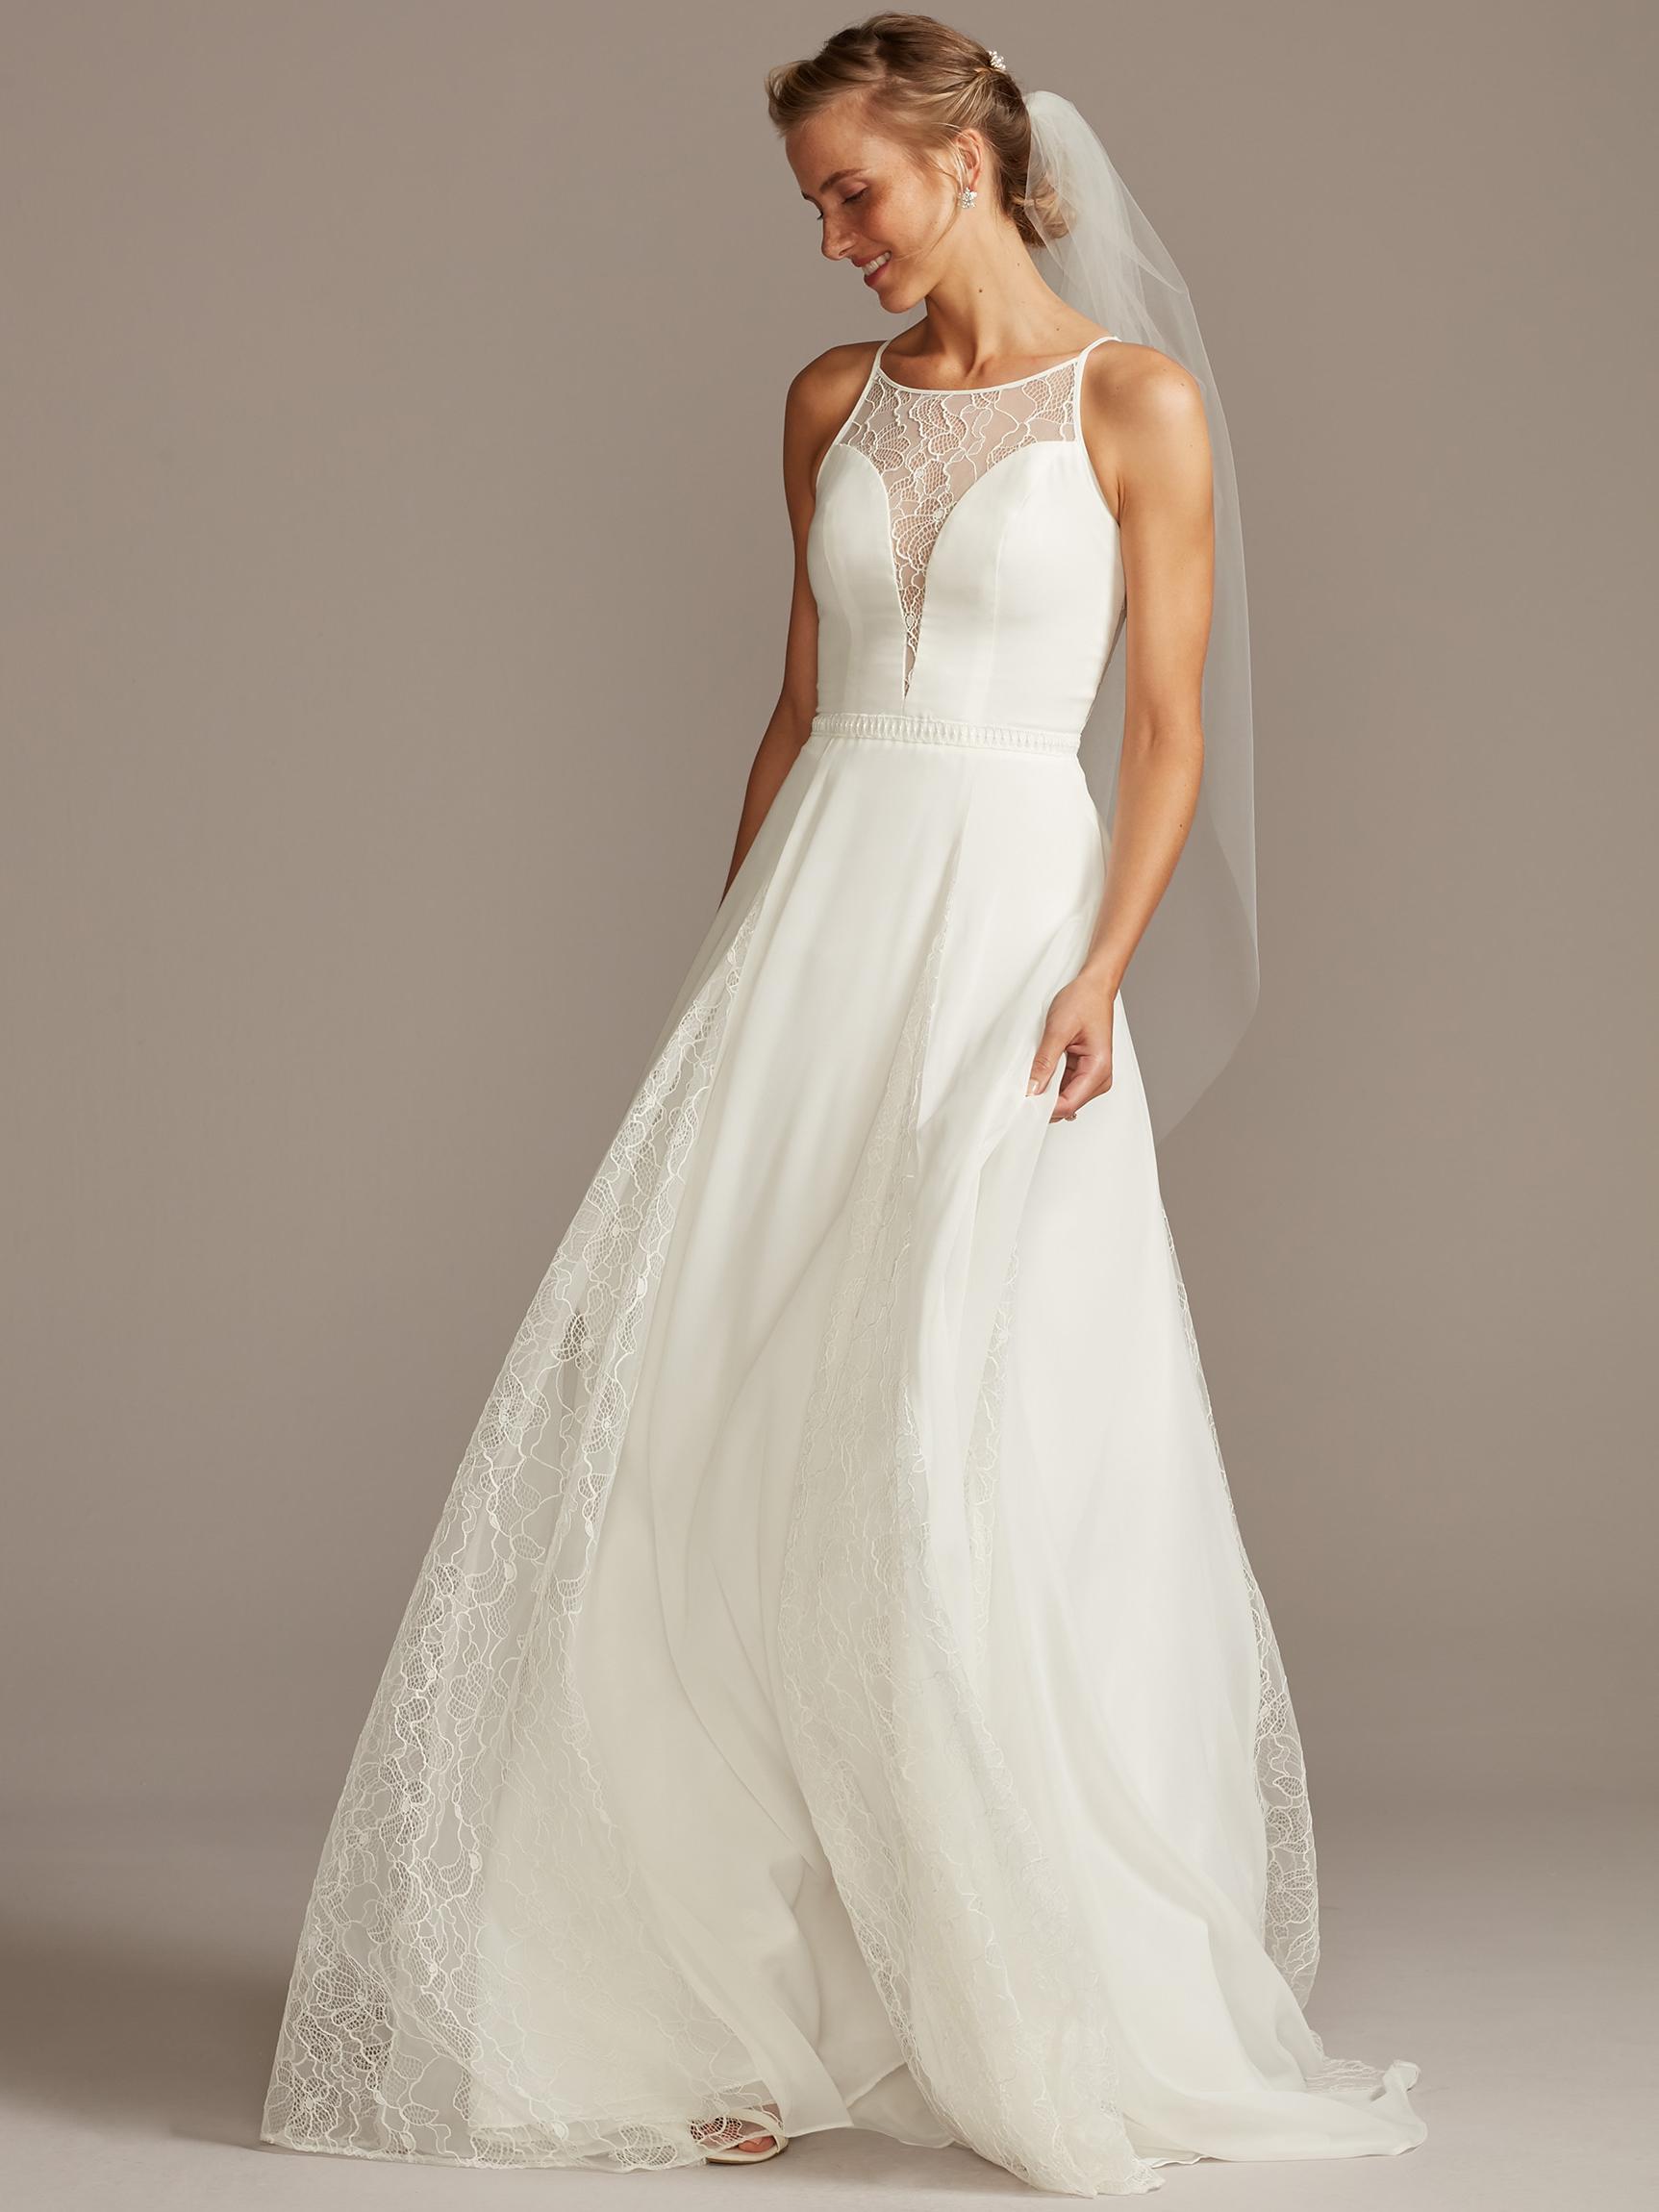 davids bridal melissa sweet deep v, illusion cowl neck wedding dress fall 2020